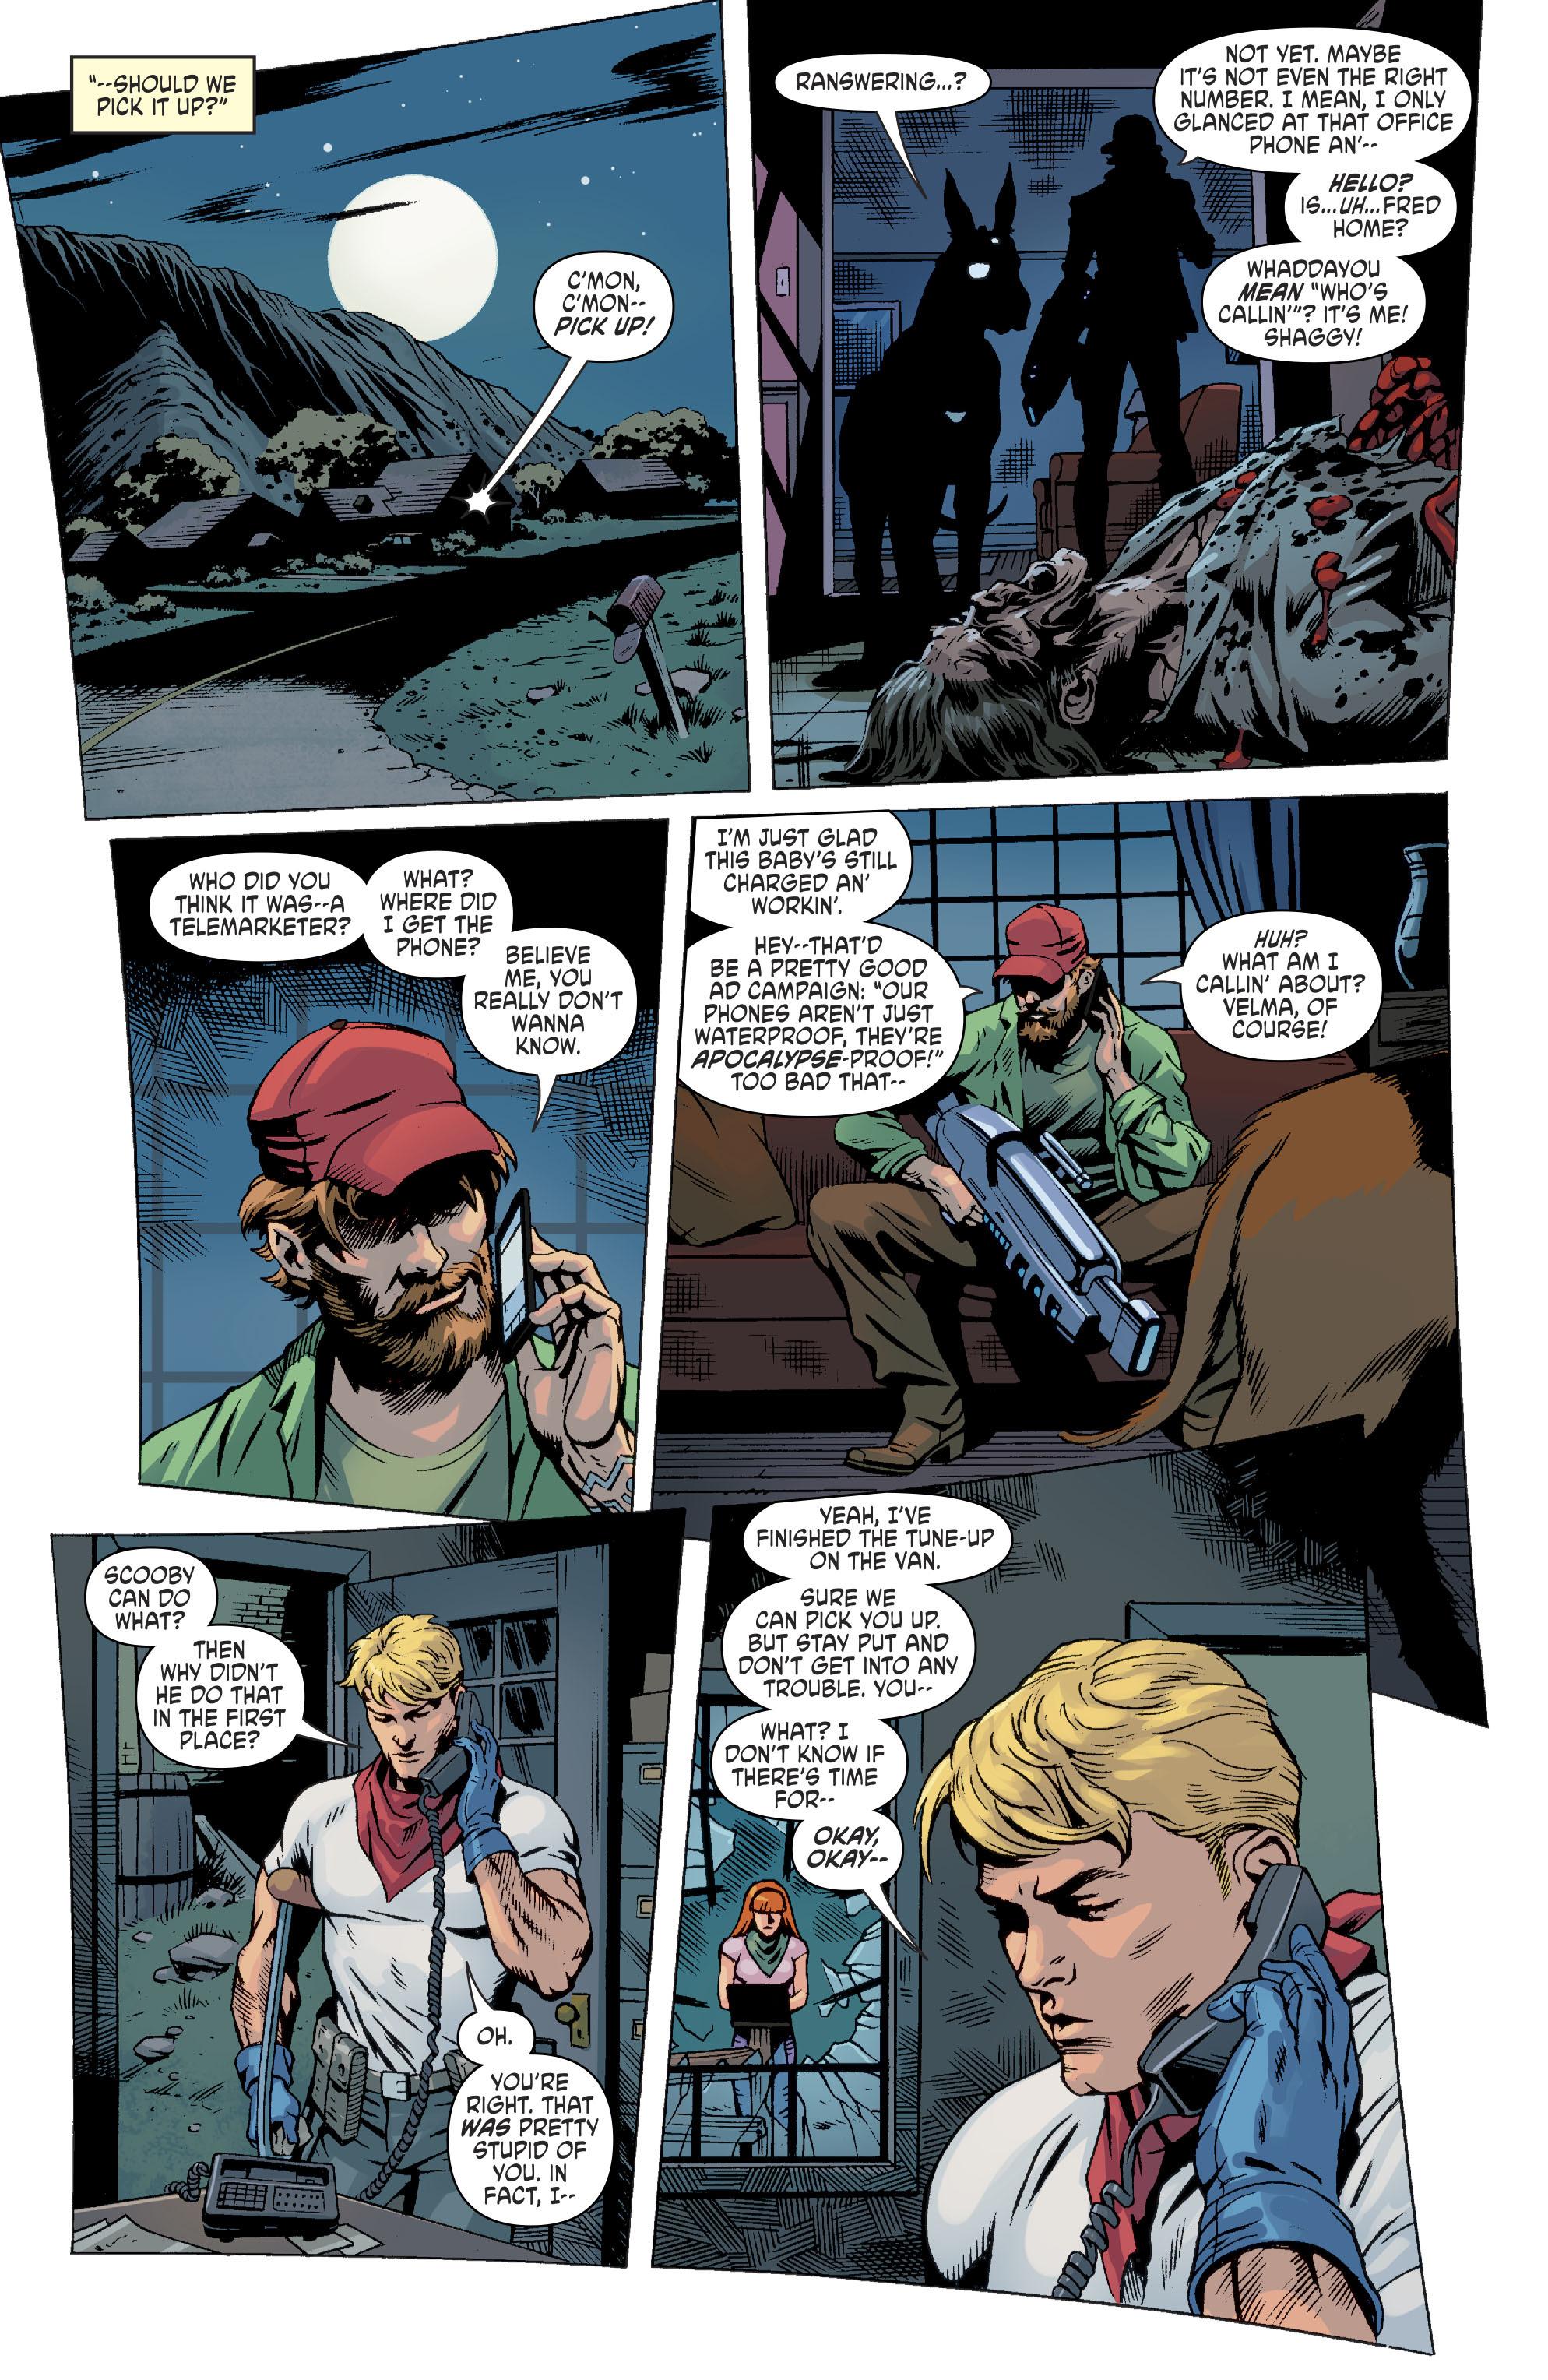 Read online Scooby Apocalypse comic -  Issue #11 - 11